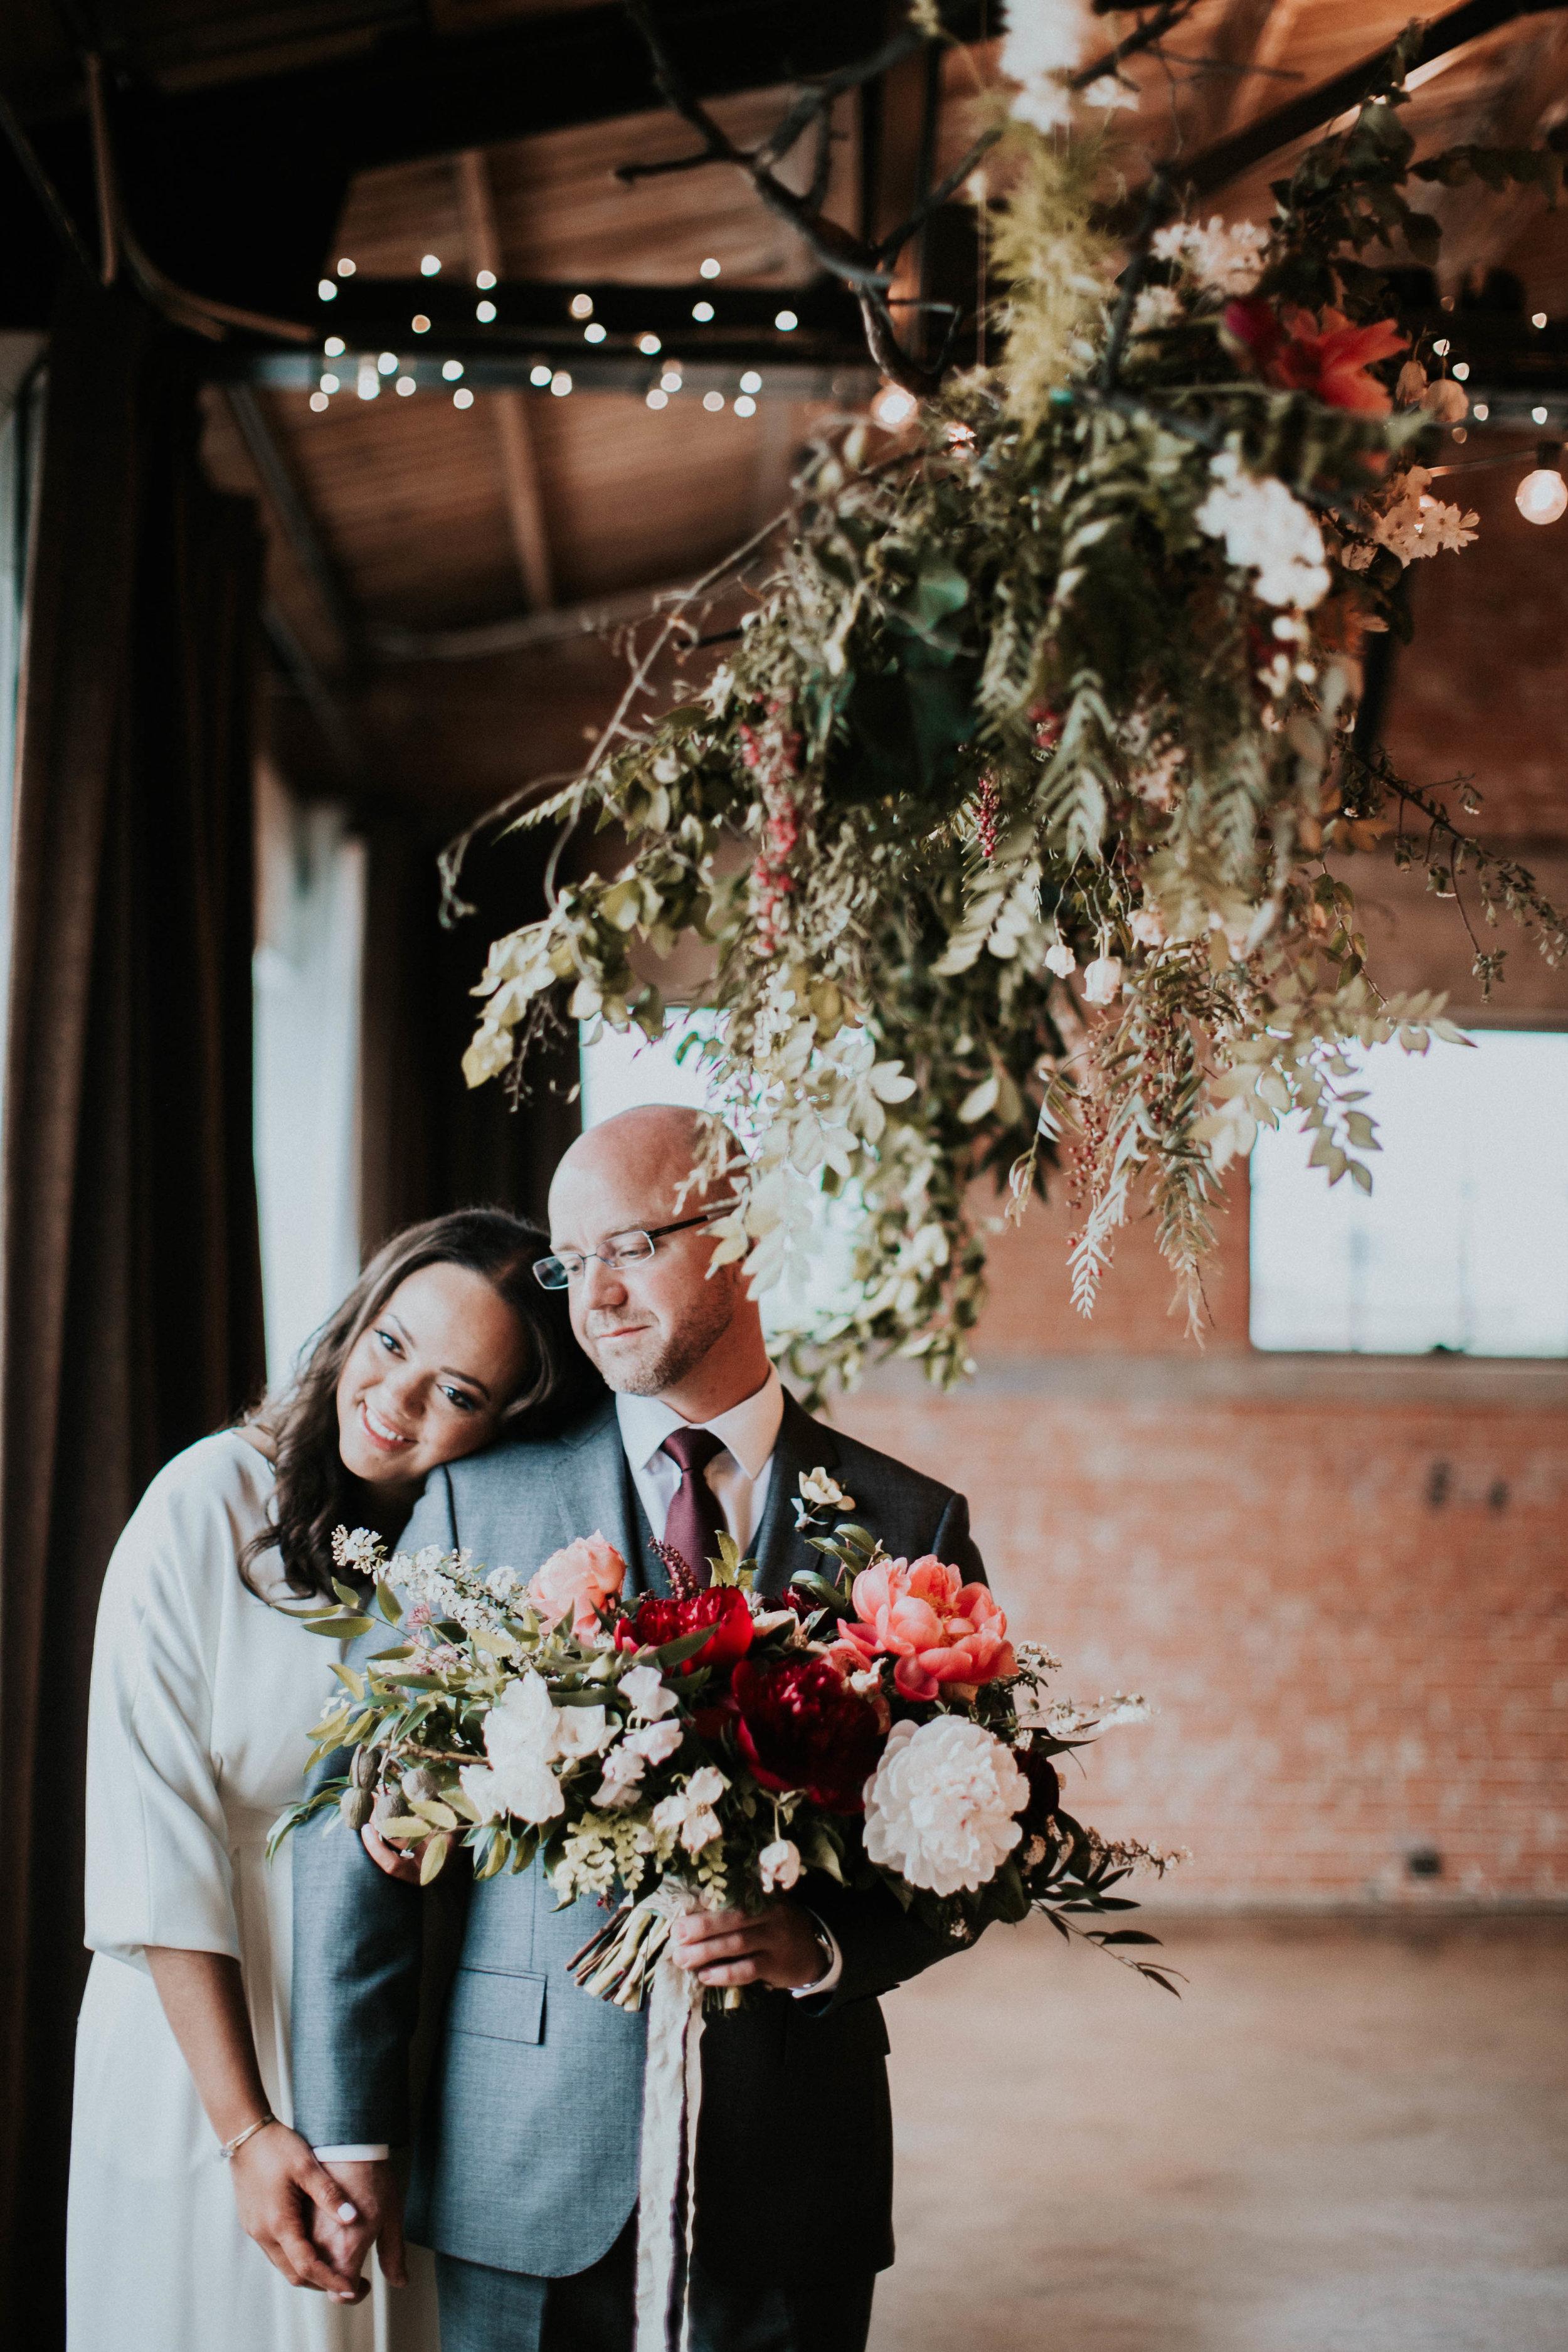 Abilene Engagment and Wedding Photographer-2533.jpg